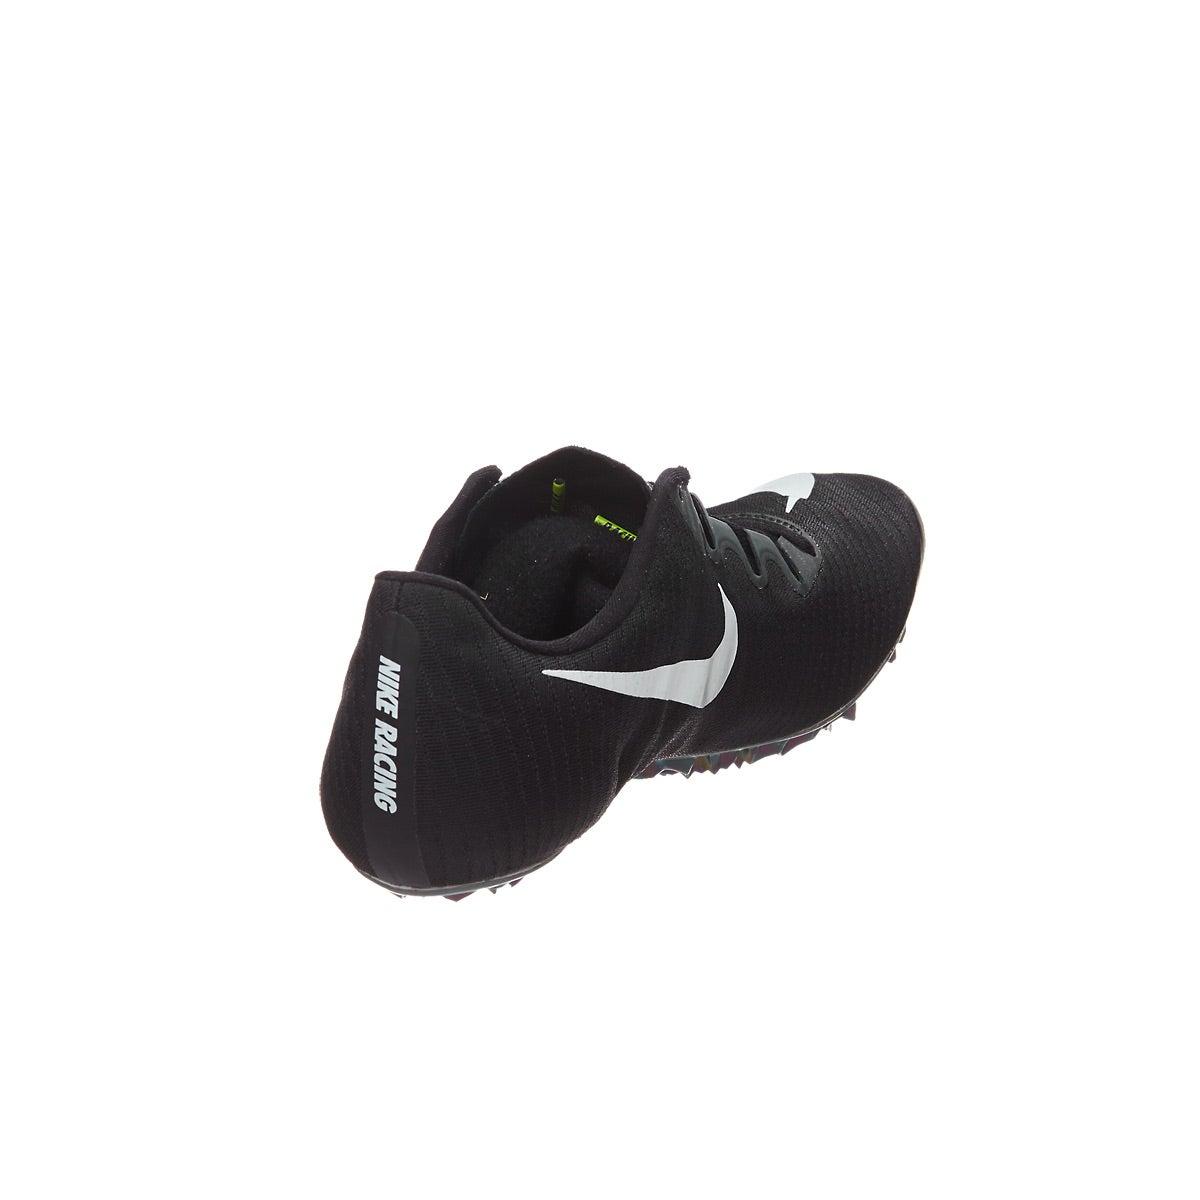 Nike Zoom Superfly Elite Unisex Spikes Black/White 360° View | Running  Warehouse Europe.